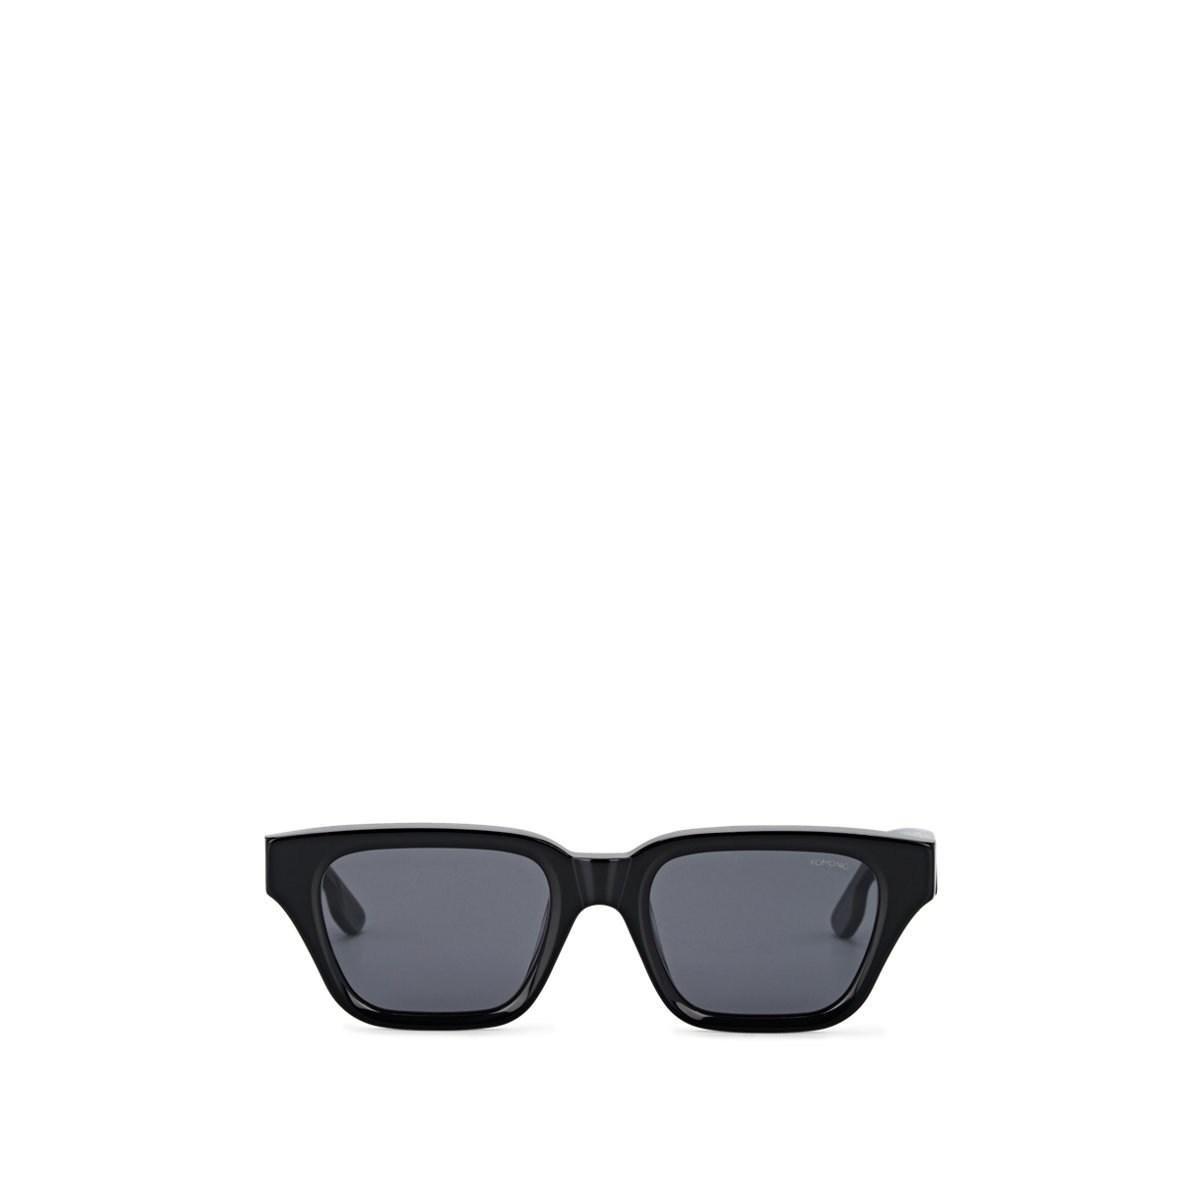 9e418cec4b3a Lyst - Komono Brooklyn Sunglasses in Black